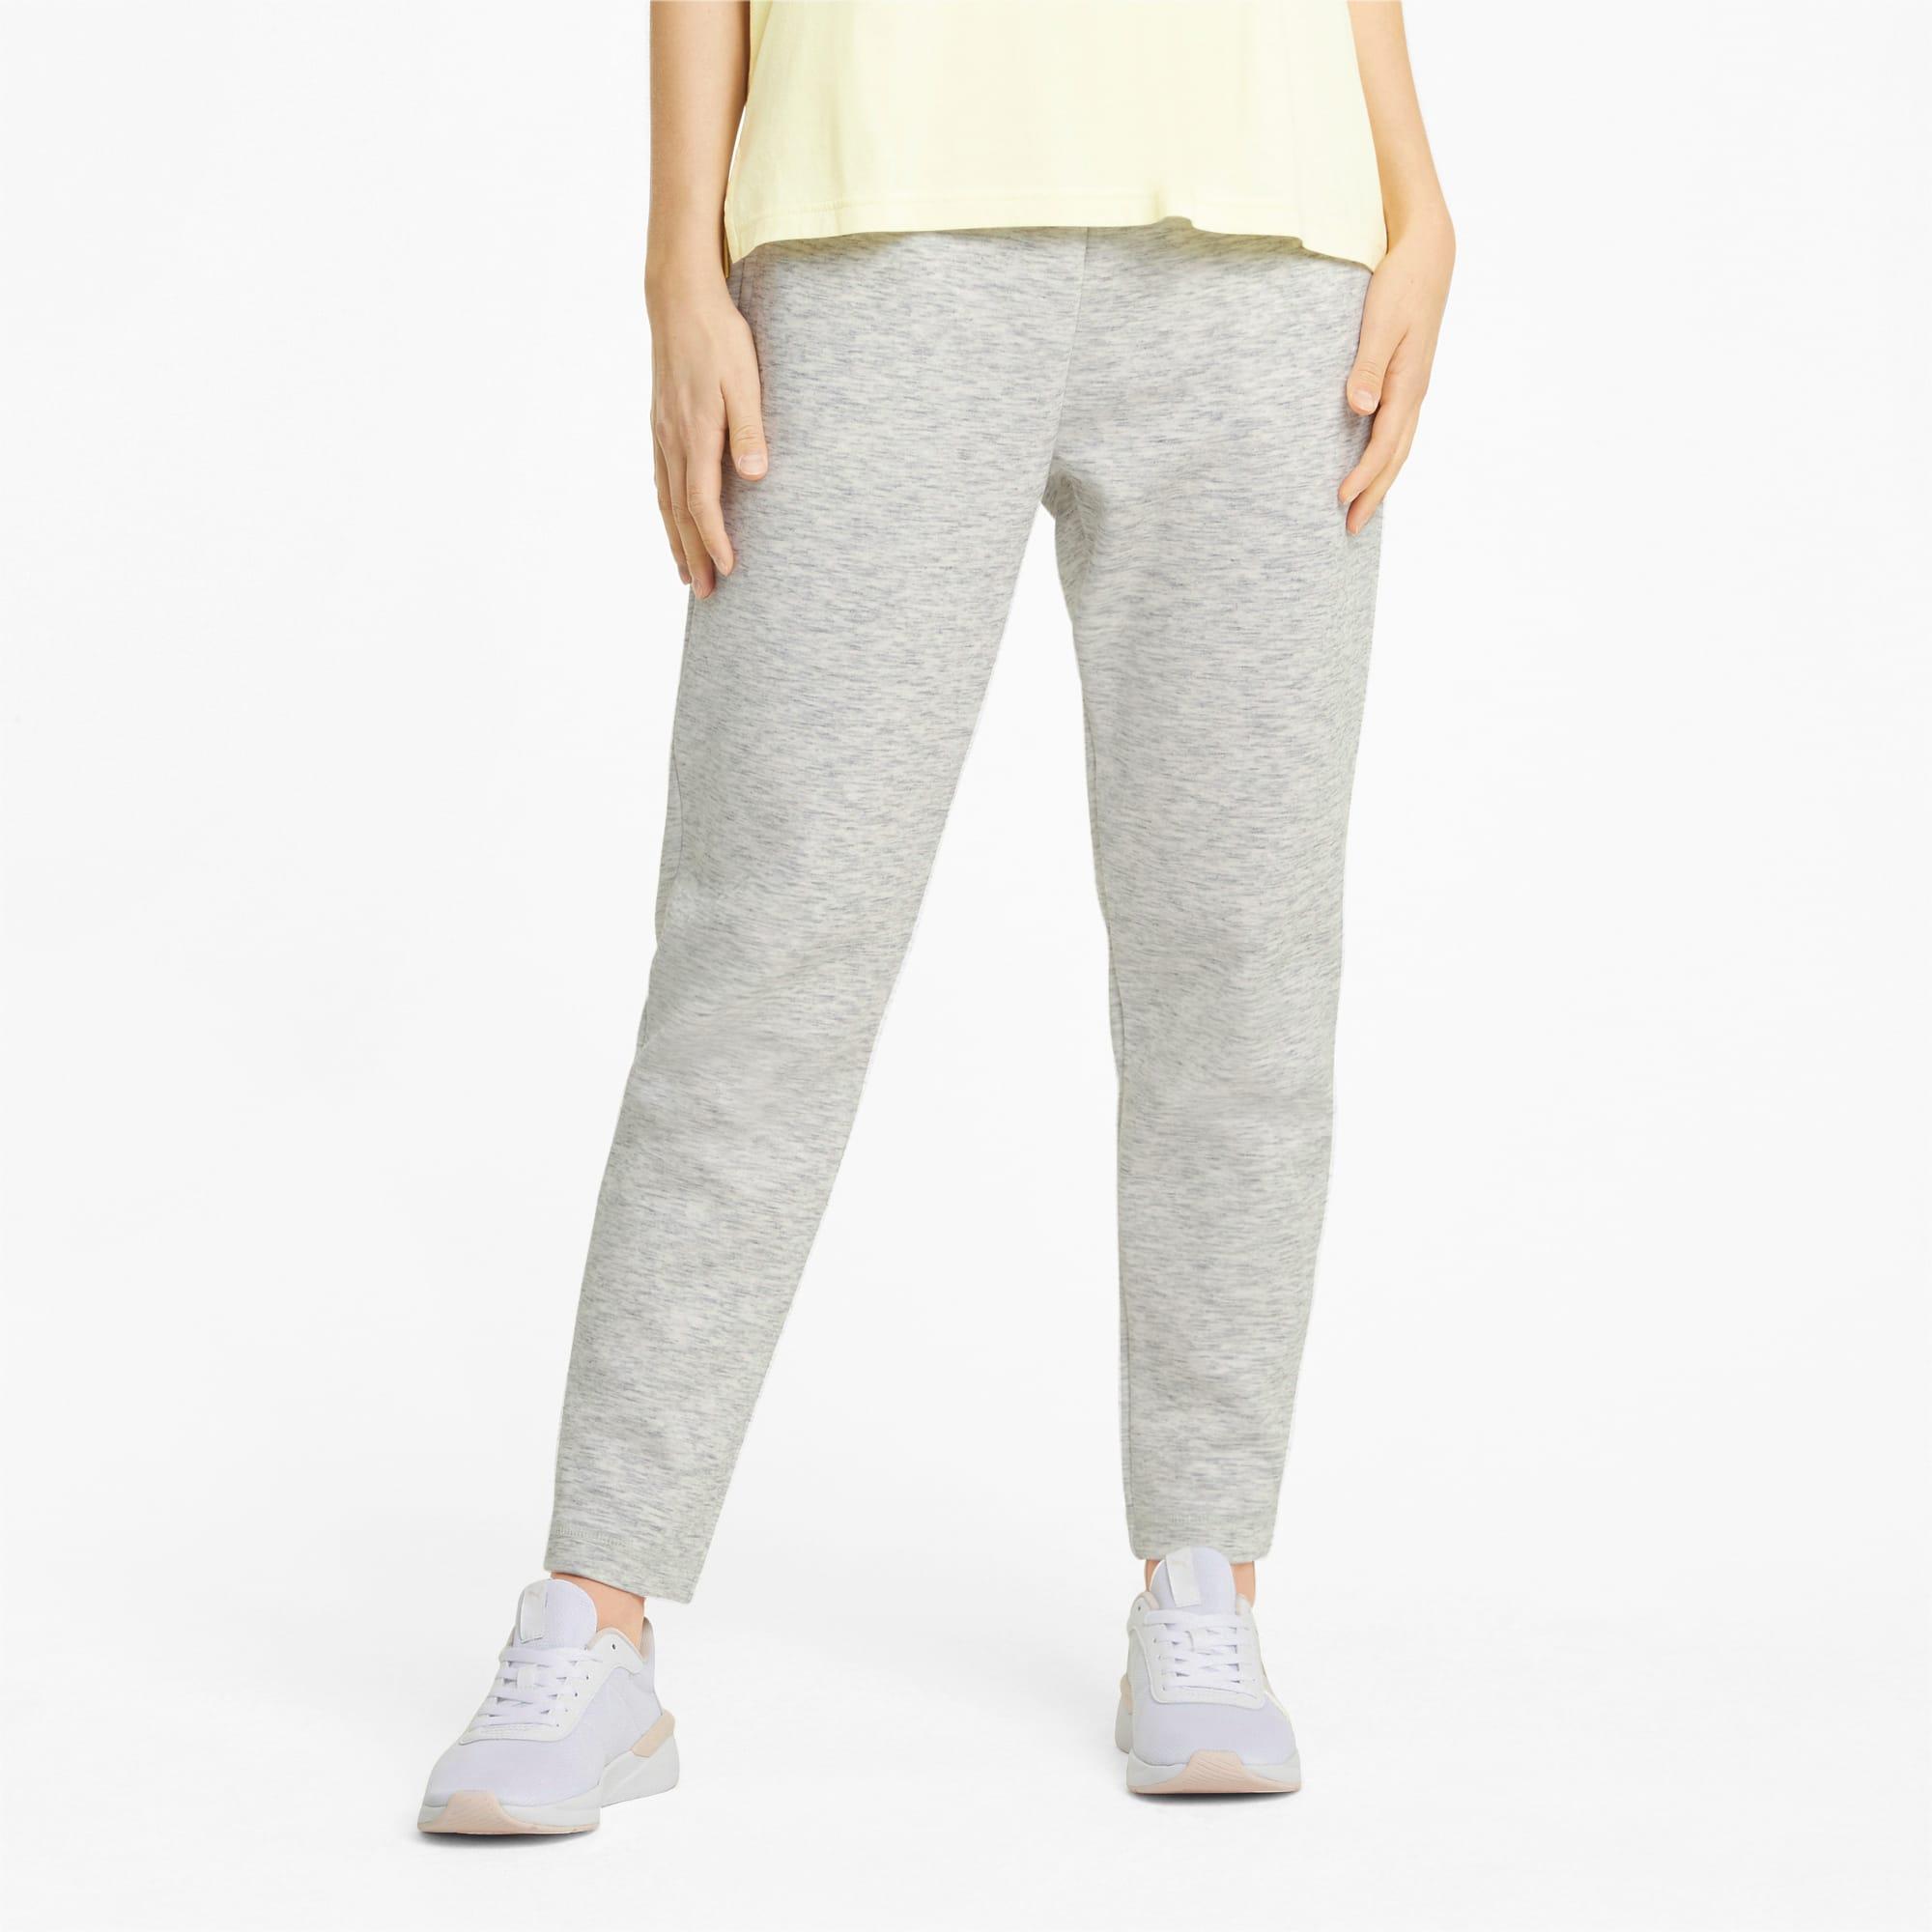 Pantalon de survêtement Evostripe femme